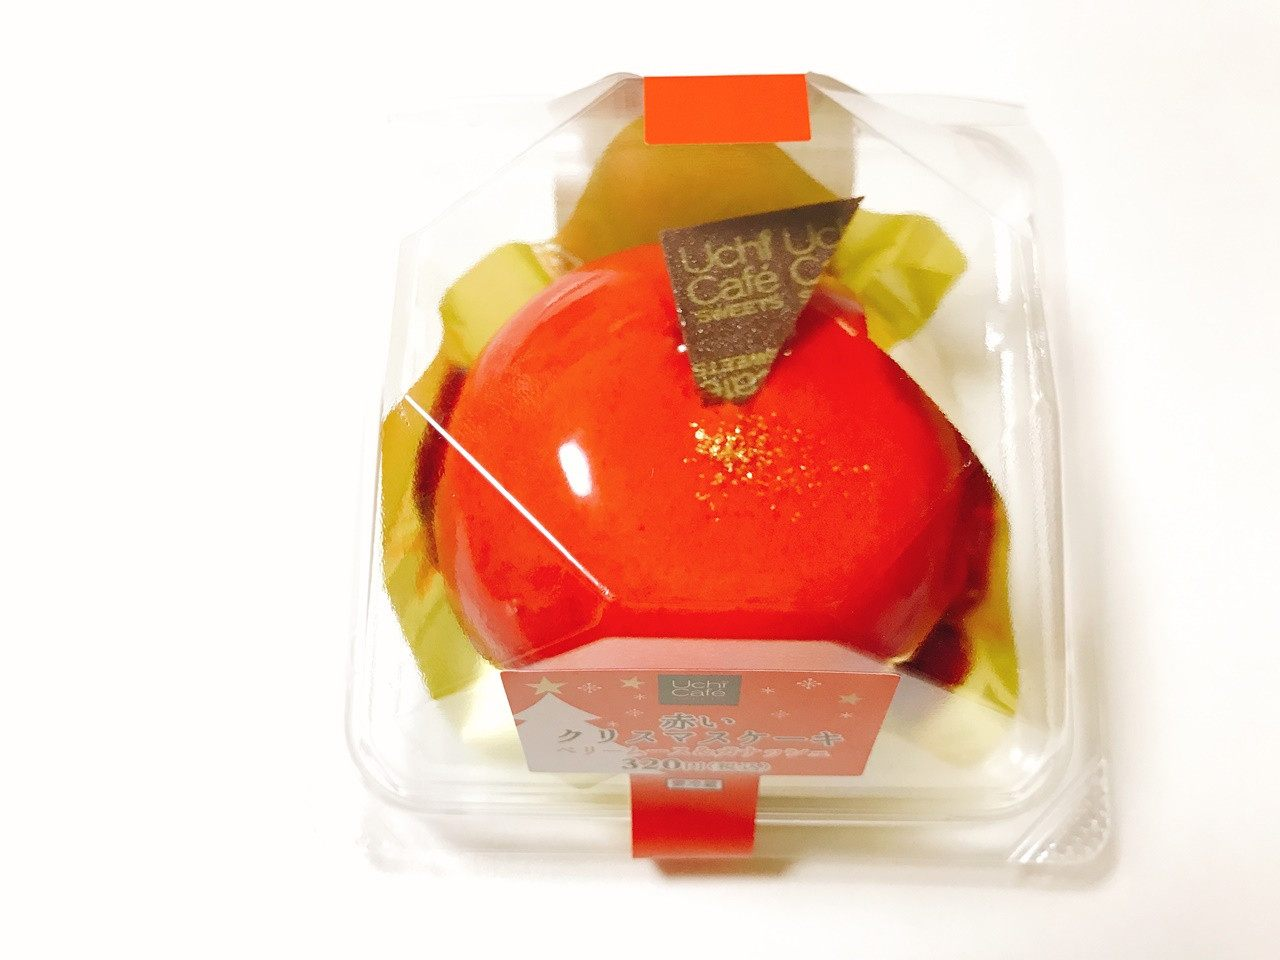 Lawson,Red Christmas cake